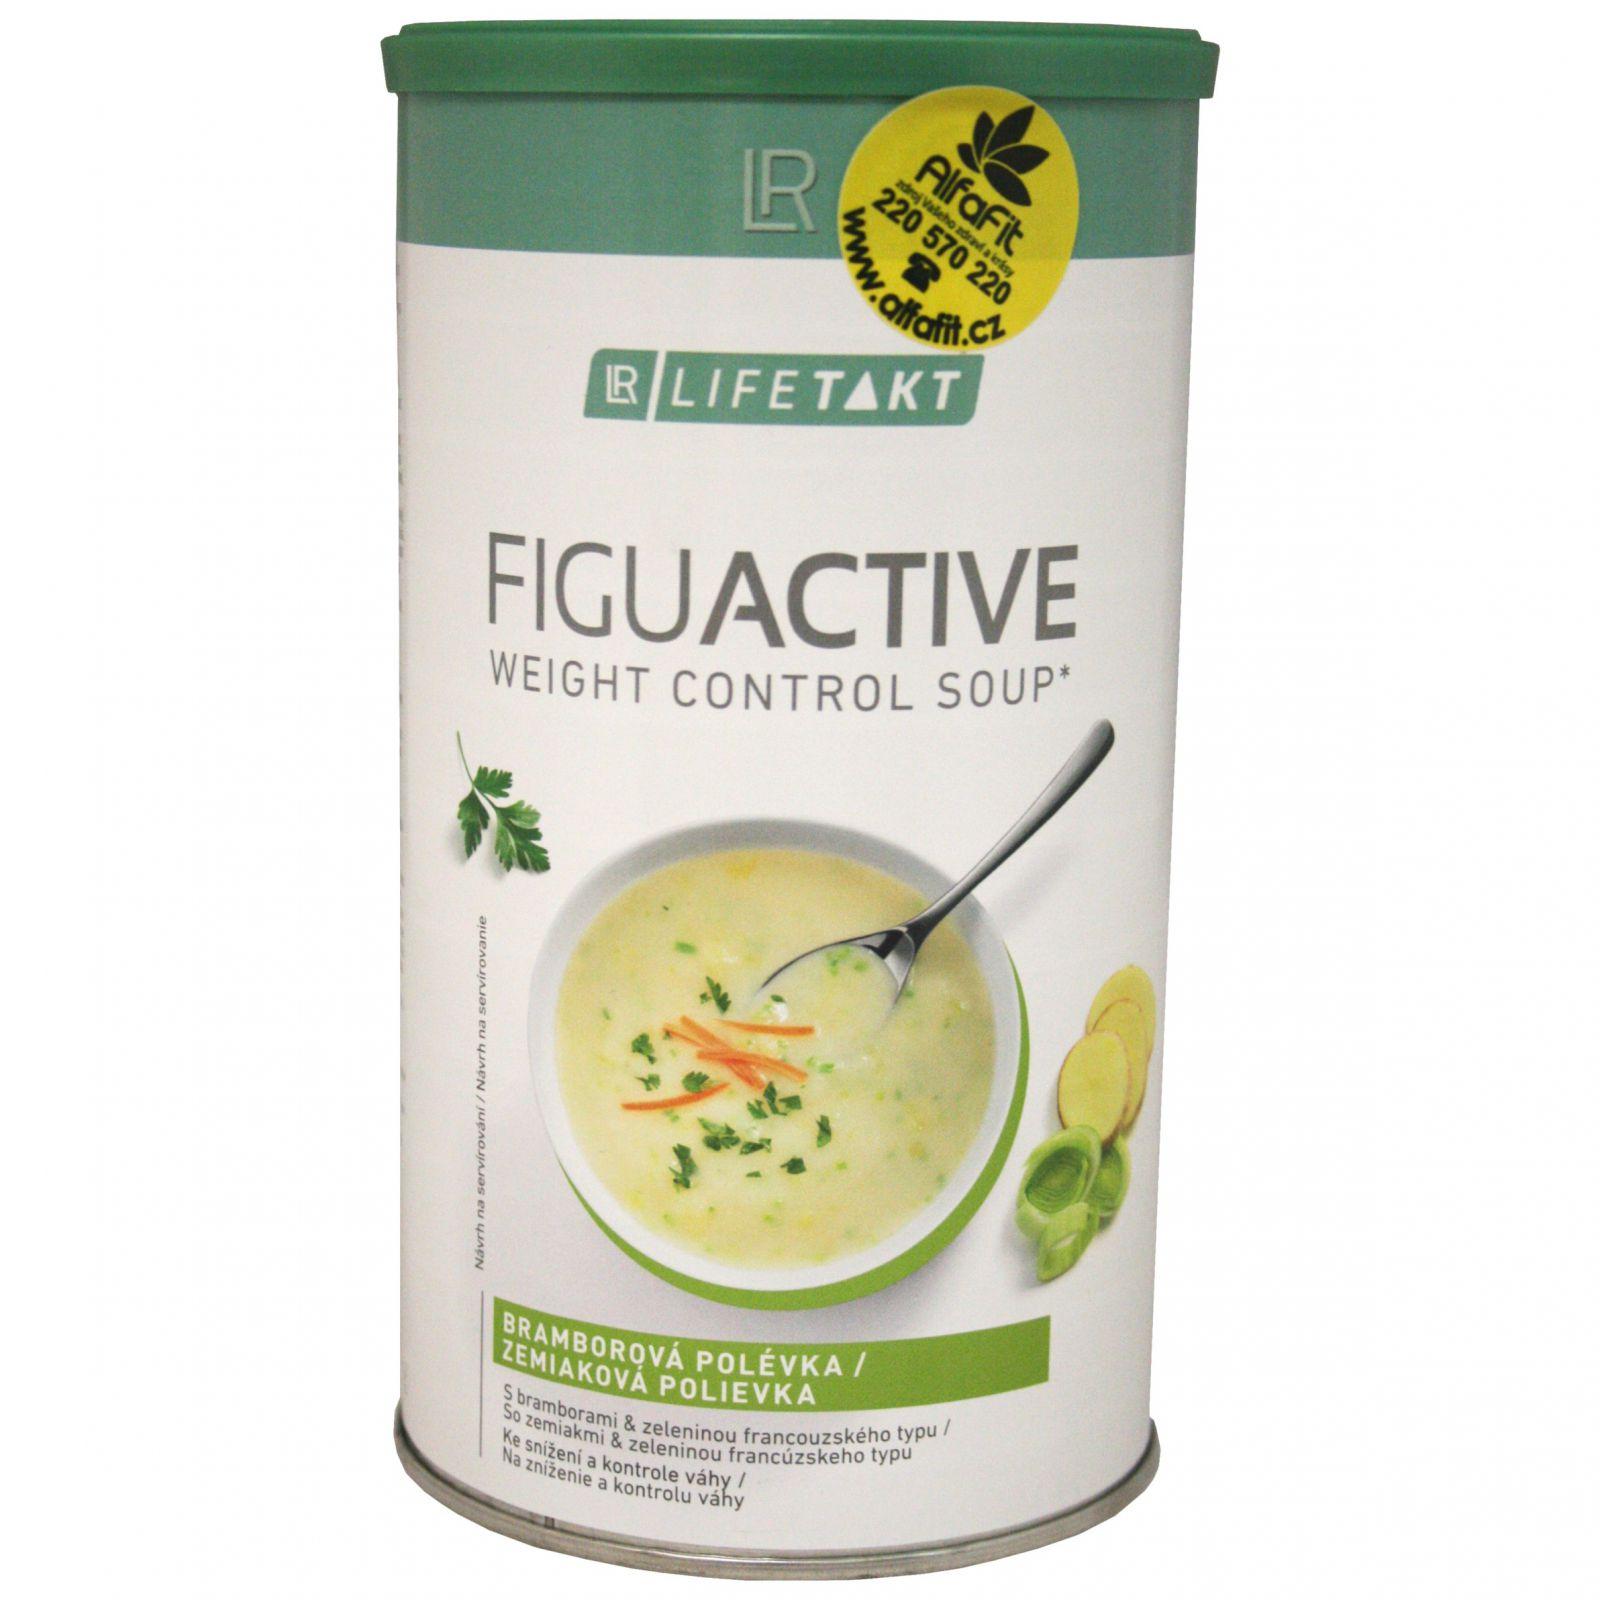 LR LIFETAKT Figu Active Bramborová polévka